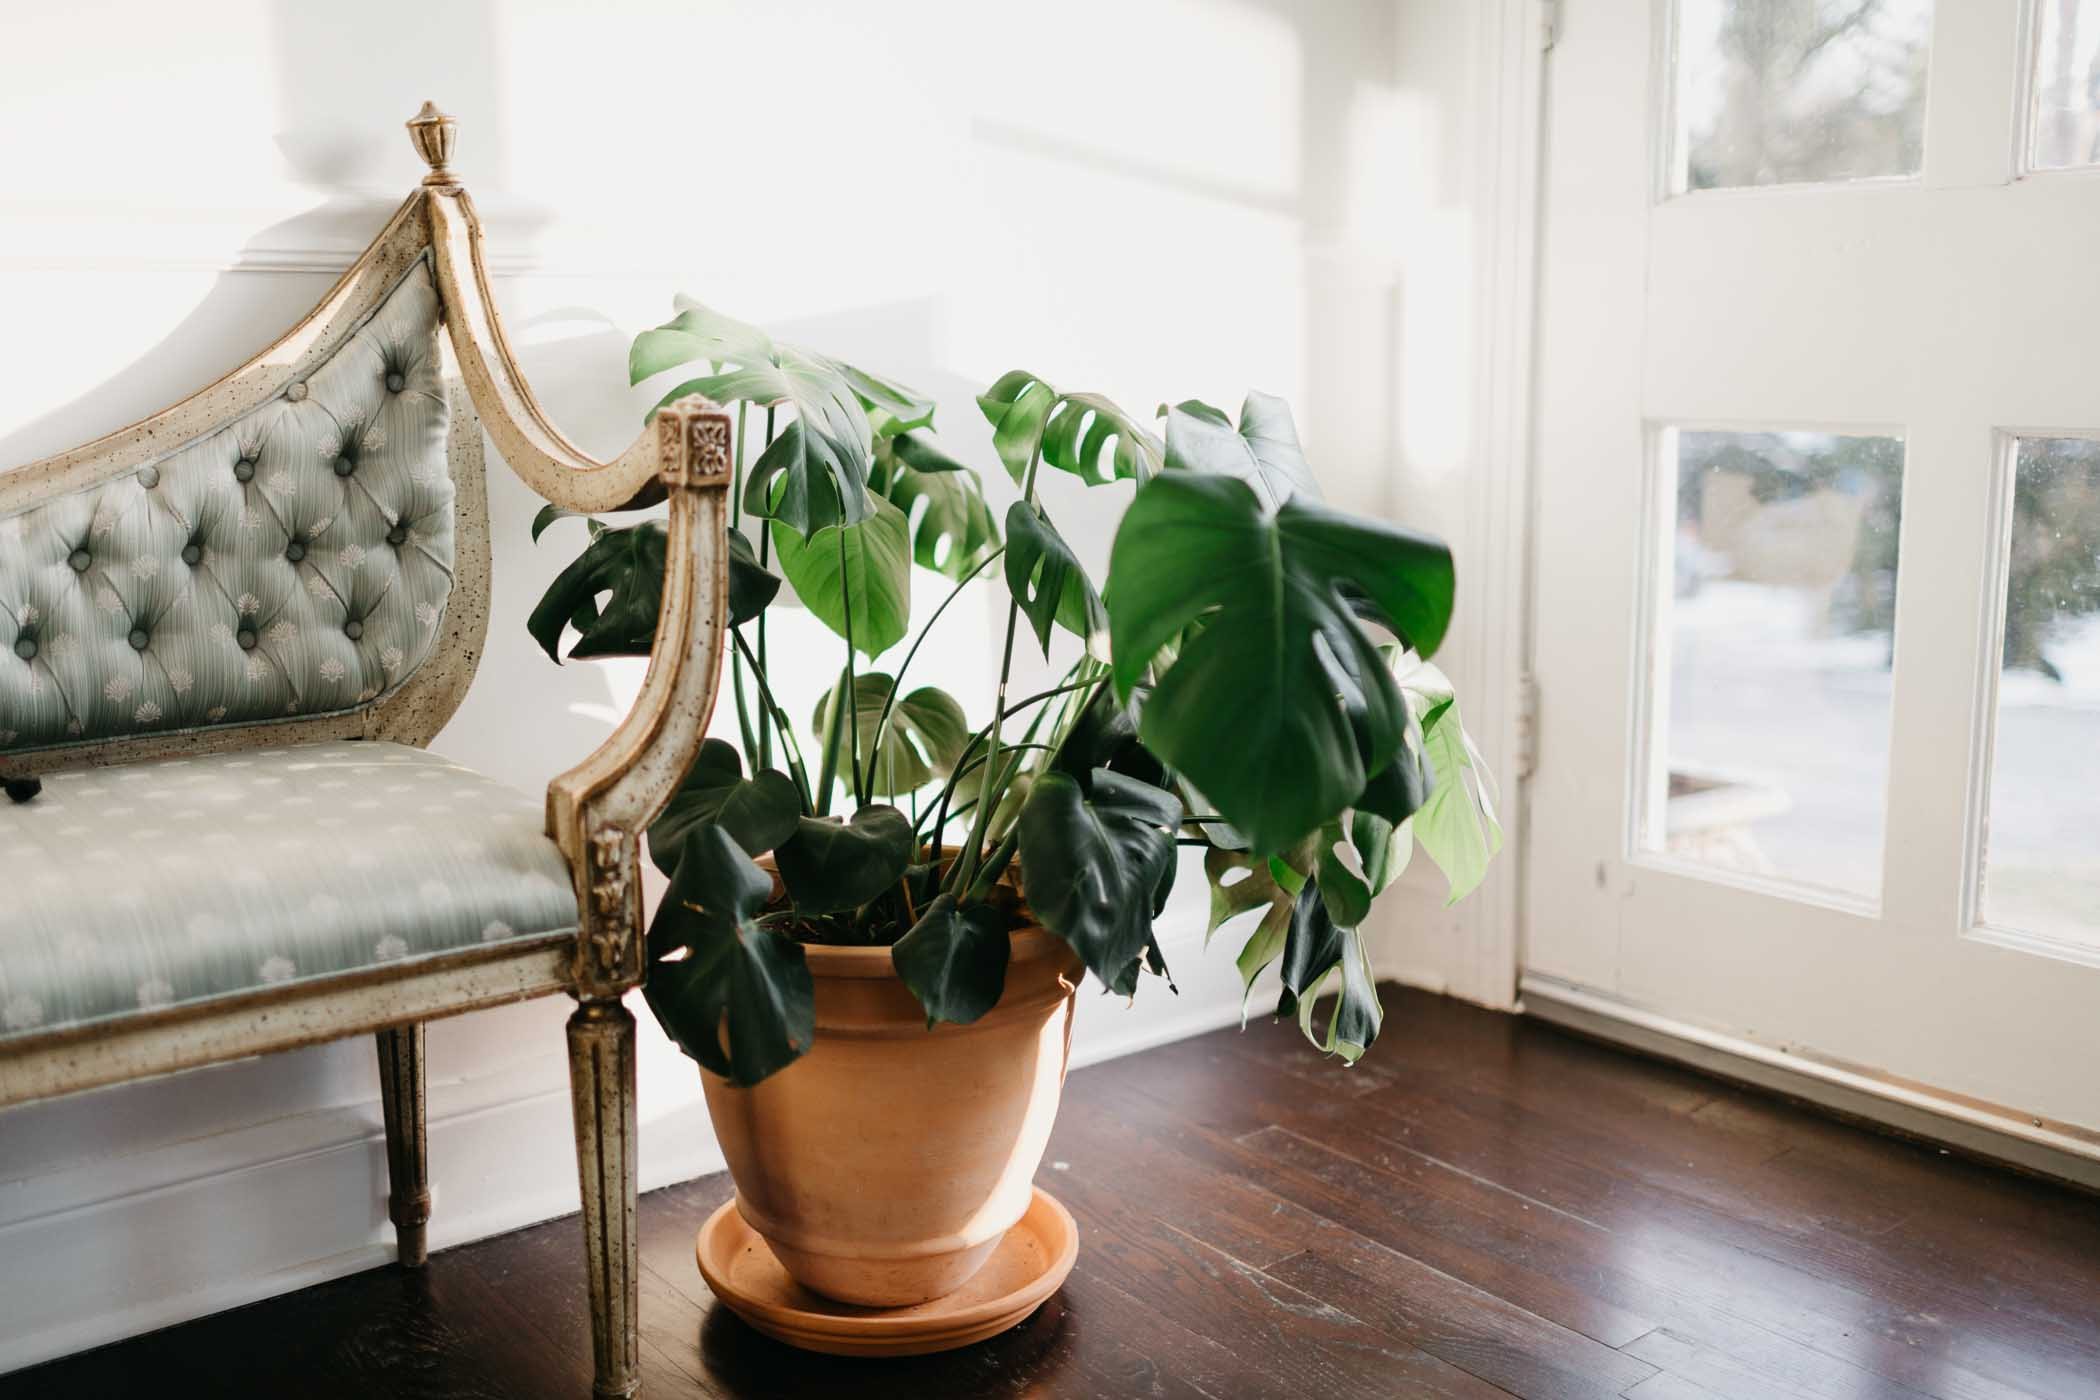 cozy-casa-nashville-tn-natural-light-studio-photography-ideas-lifestyle-photographer-photography-33.jpg